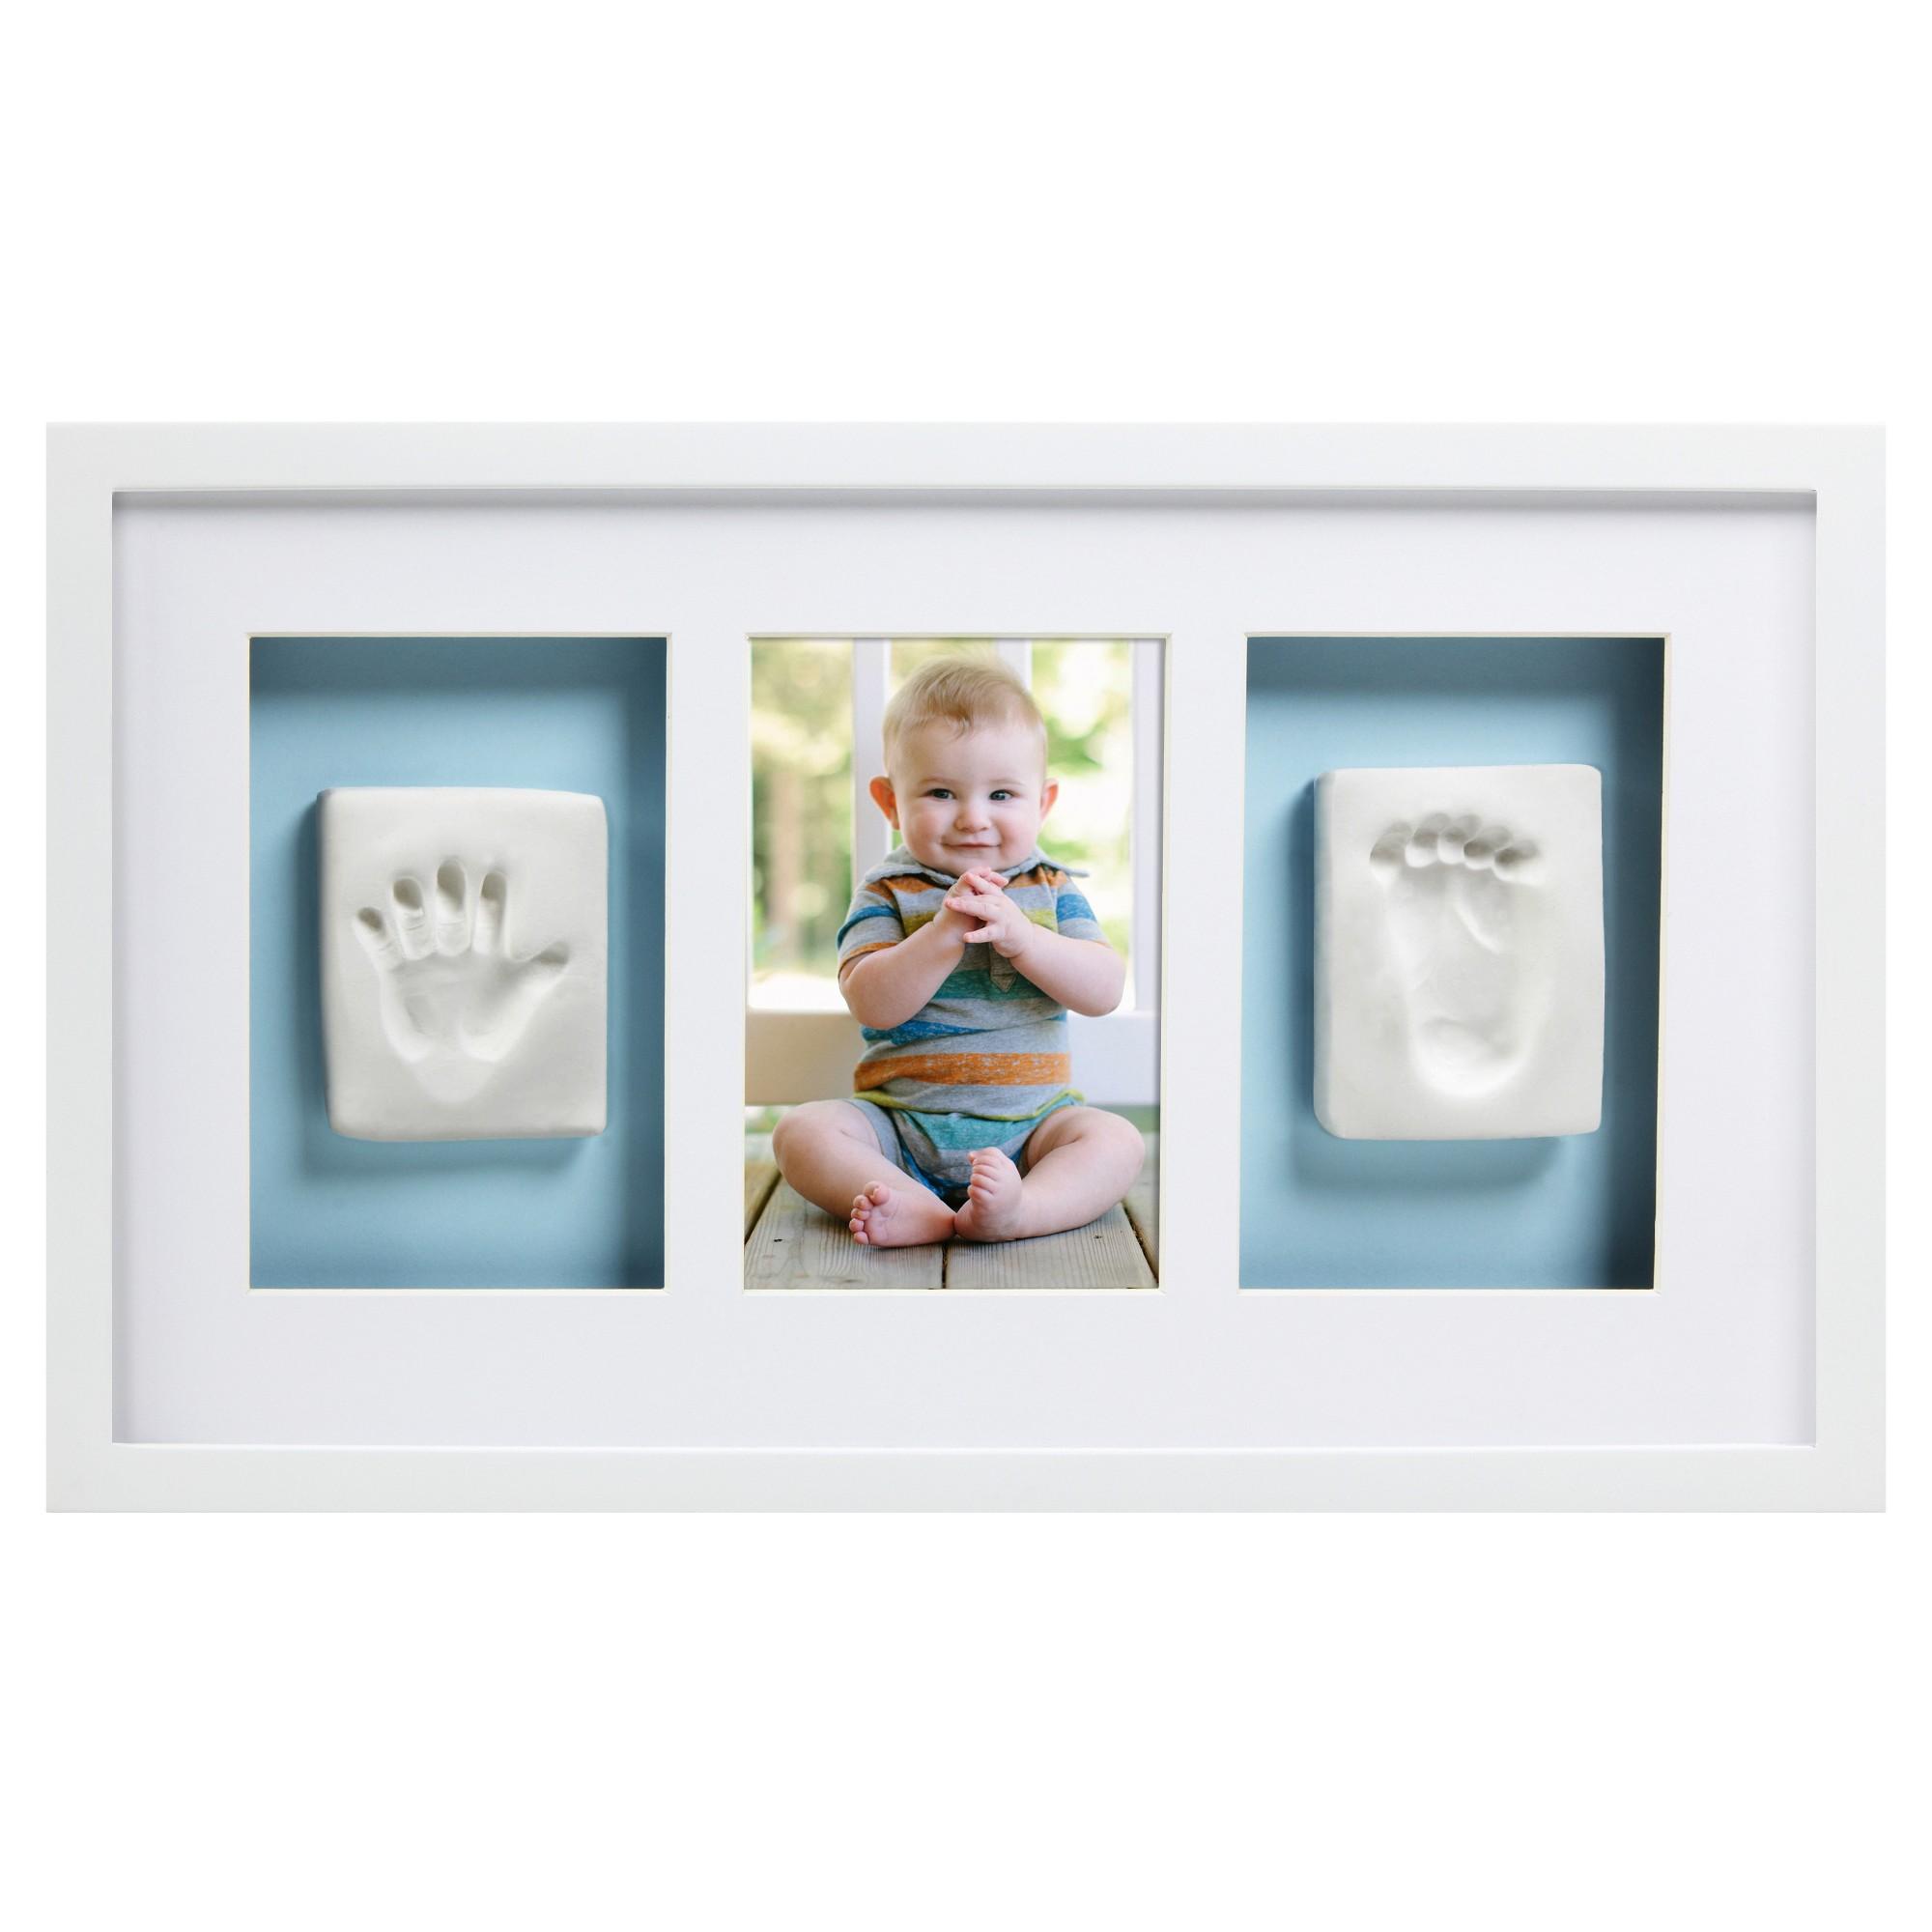 Babyprints Baby Handprint and Footprint Photo Frame Kit